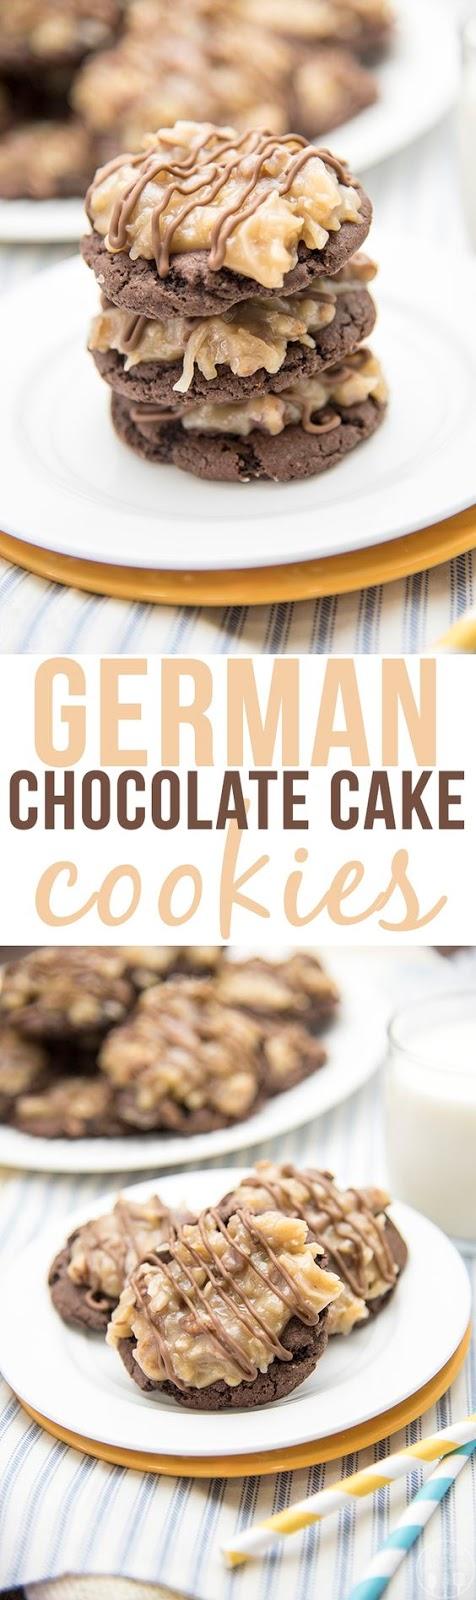 Pillsbury German Chocolate Cake Frosting